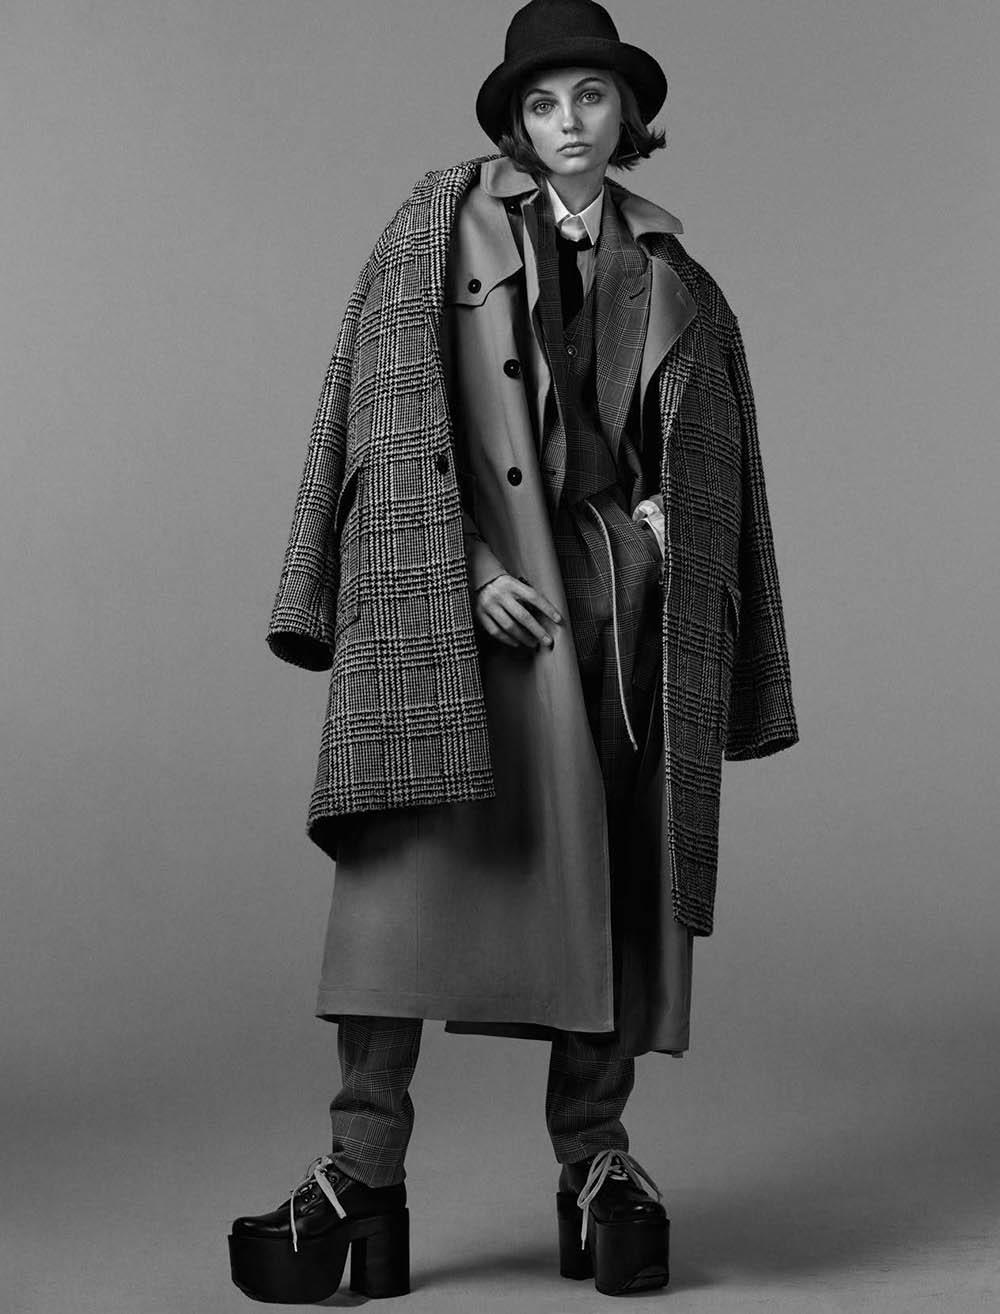 Fran Summers by Christian MacDonald for Vogue Paris August 2018